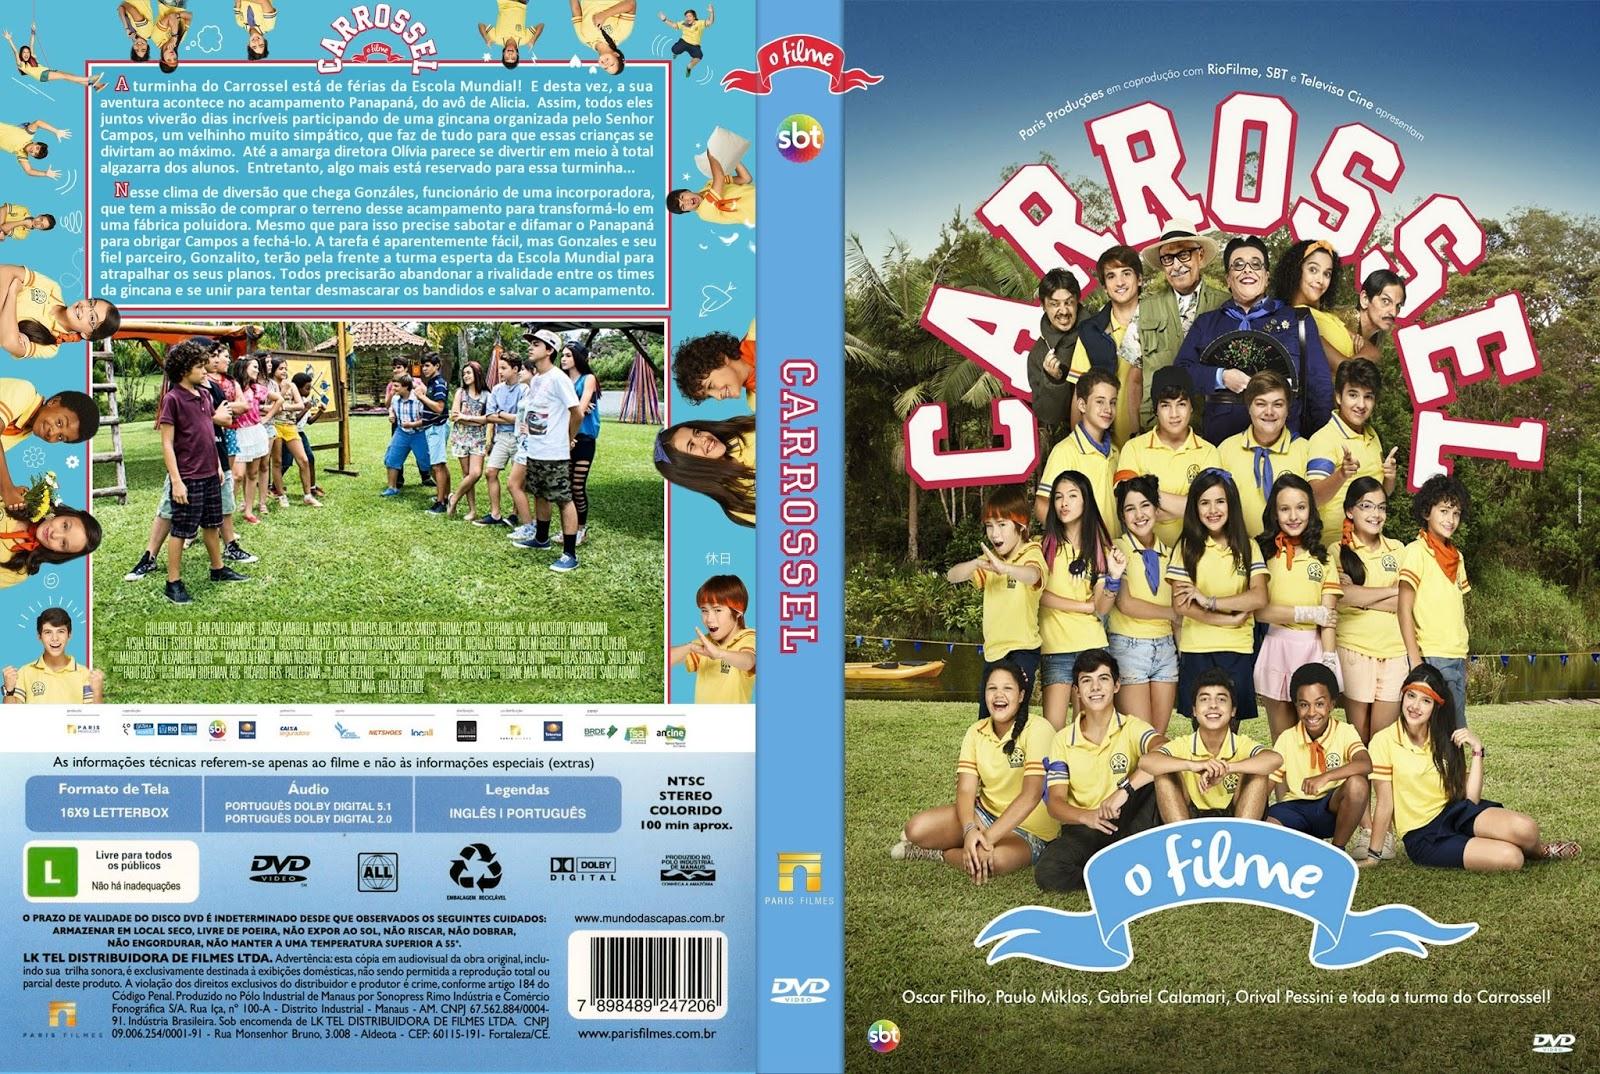 Download Carrossel O Filme HDRip XviD Nacional Carrossel 2B  2BO 2BFilme 2Bcapa 2Bdvd